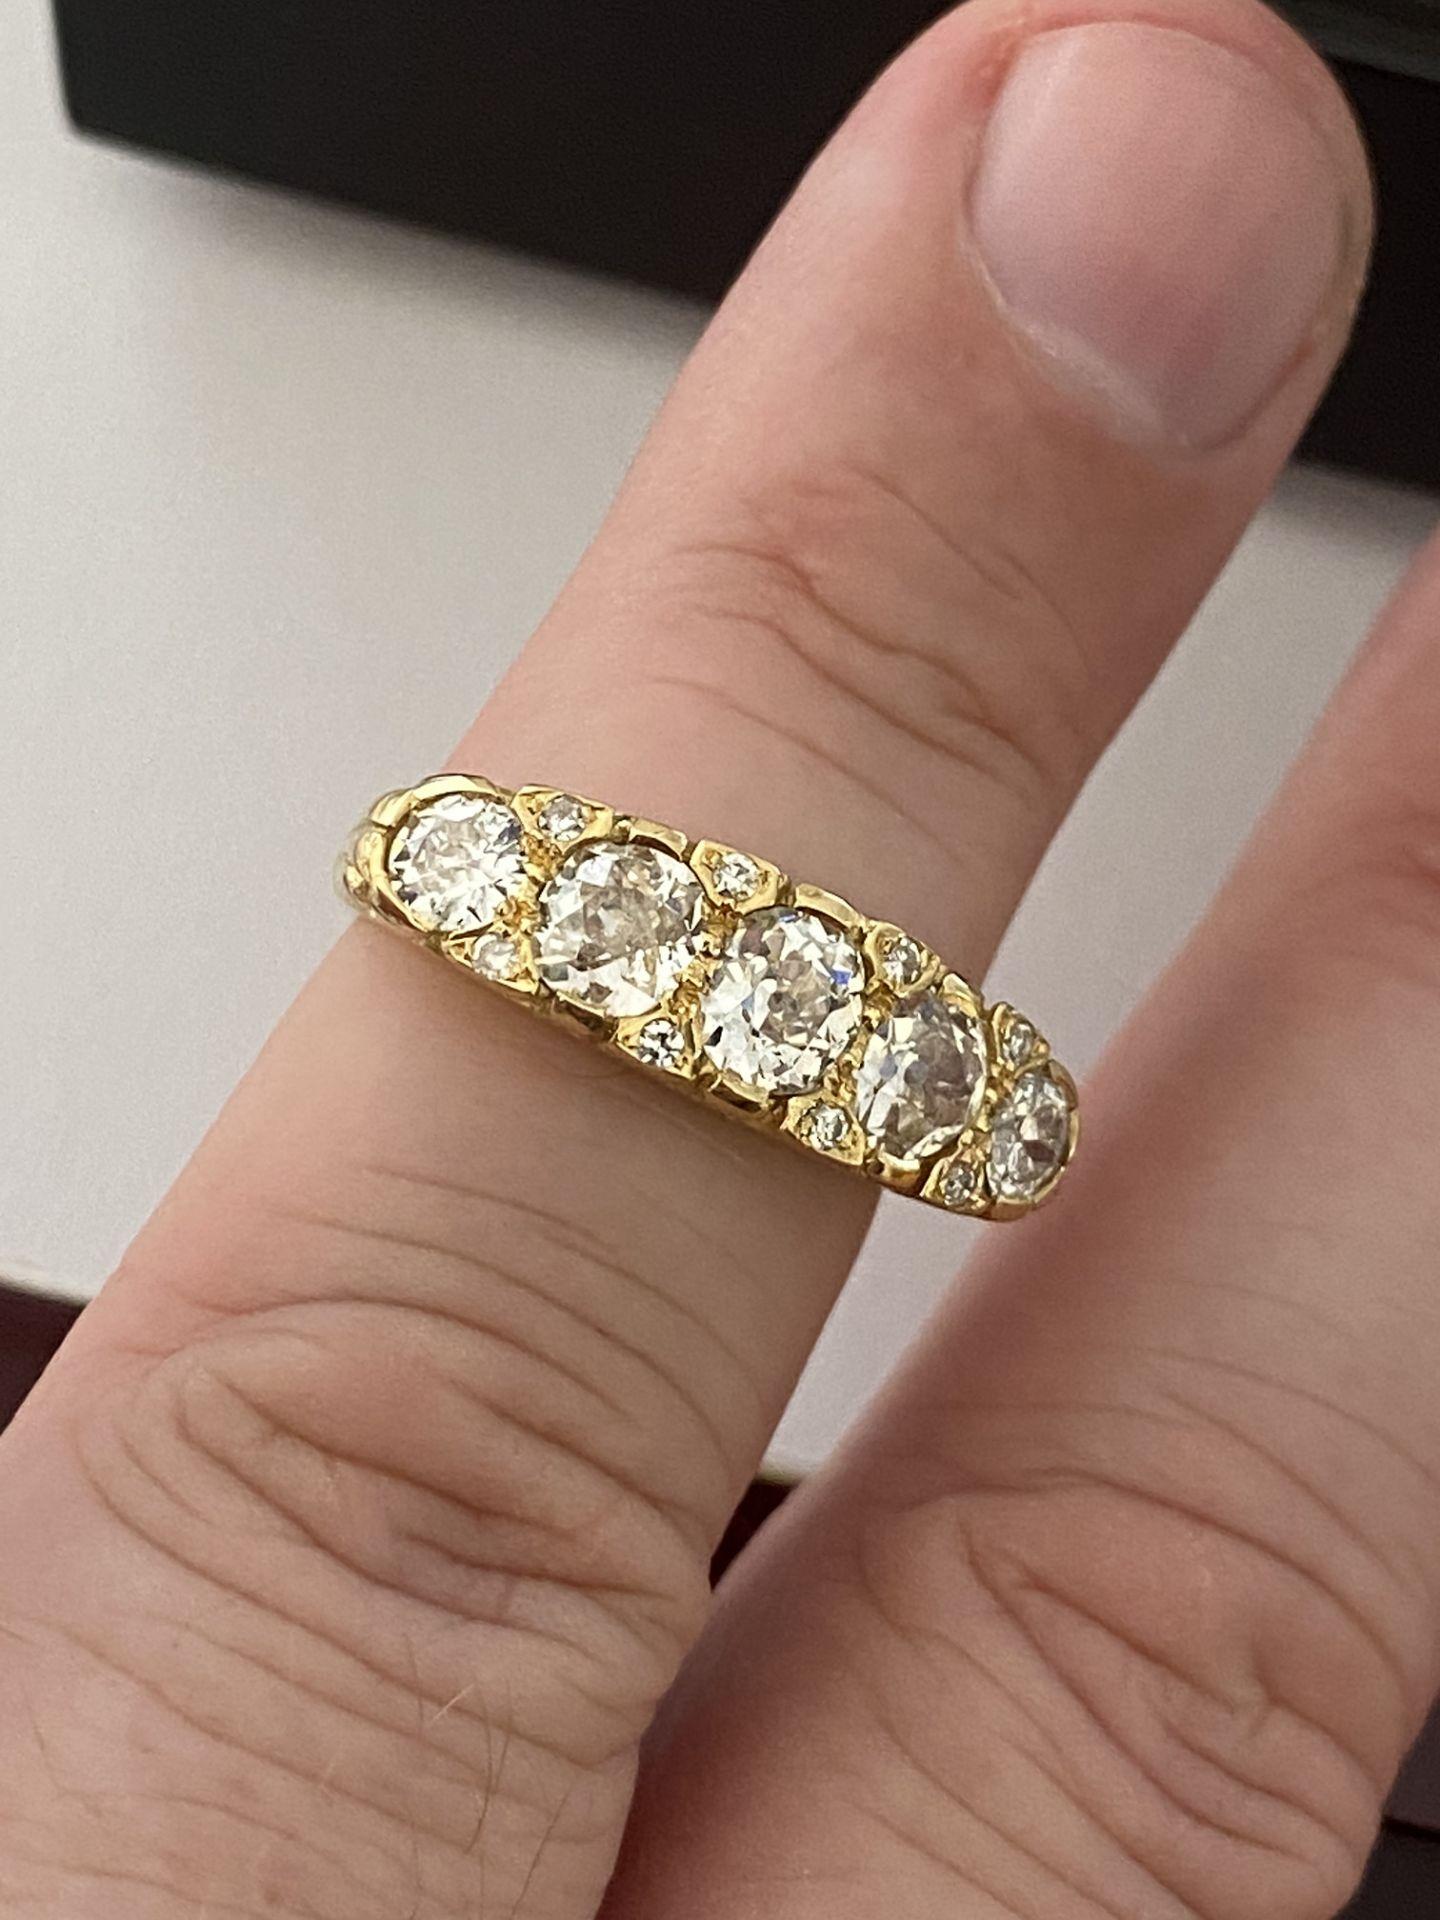 FINE 18ct YELLOW GOLD 2.00ct 5 STONE DIAMOND RING - Image 11 of 15